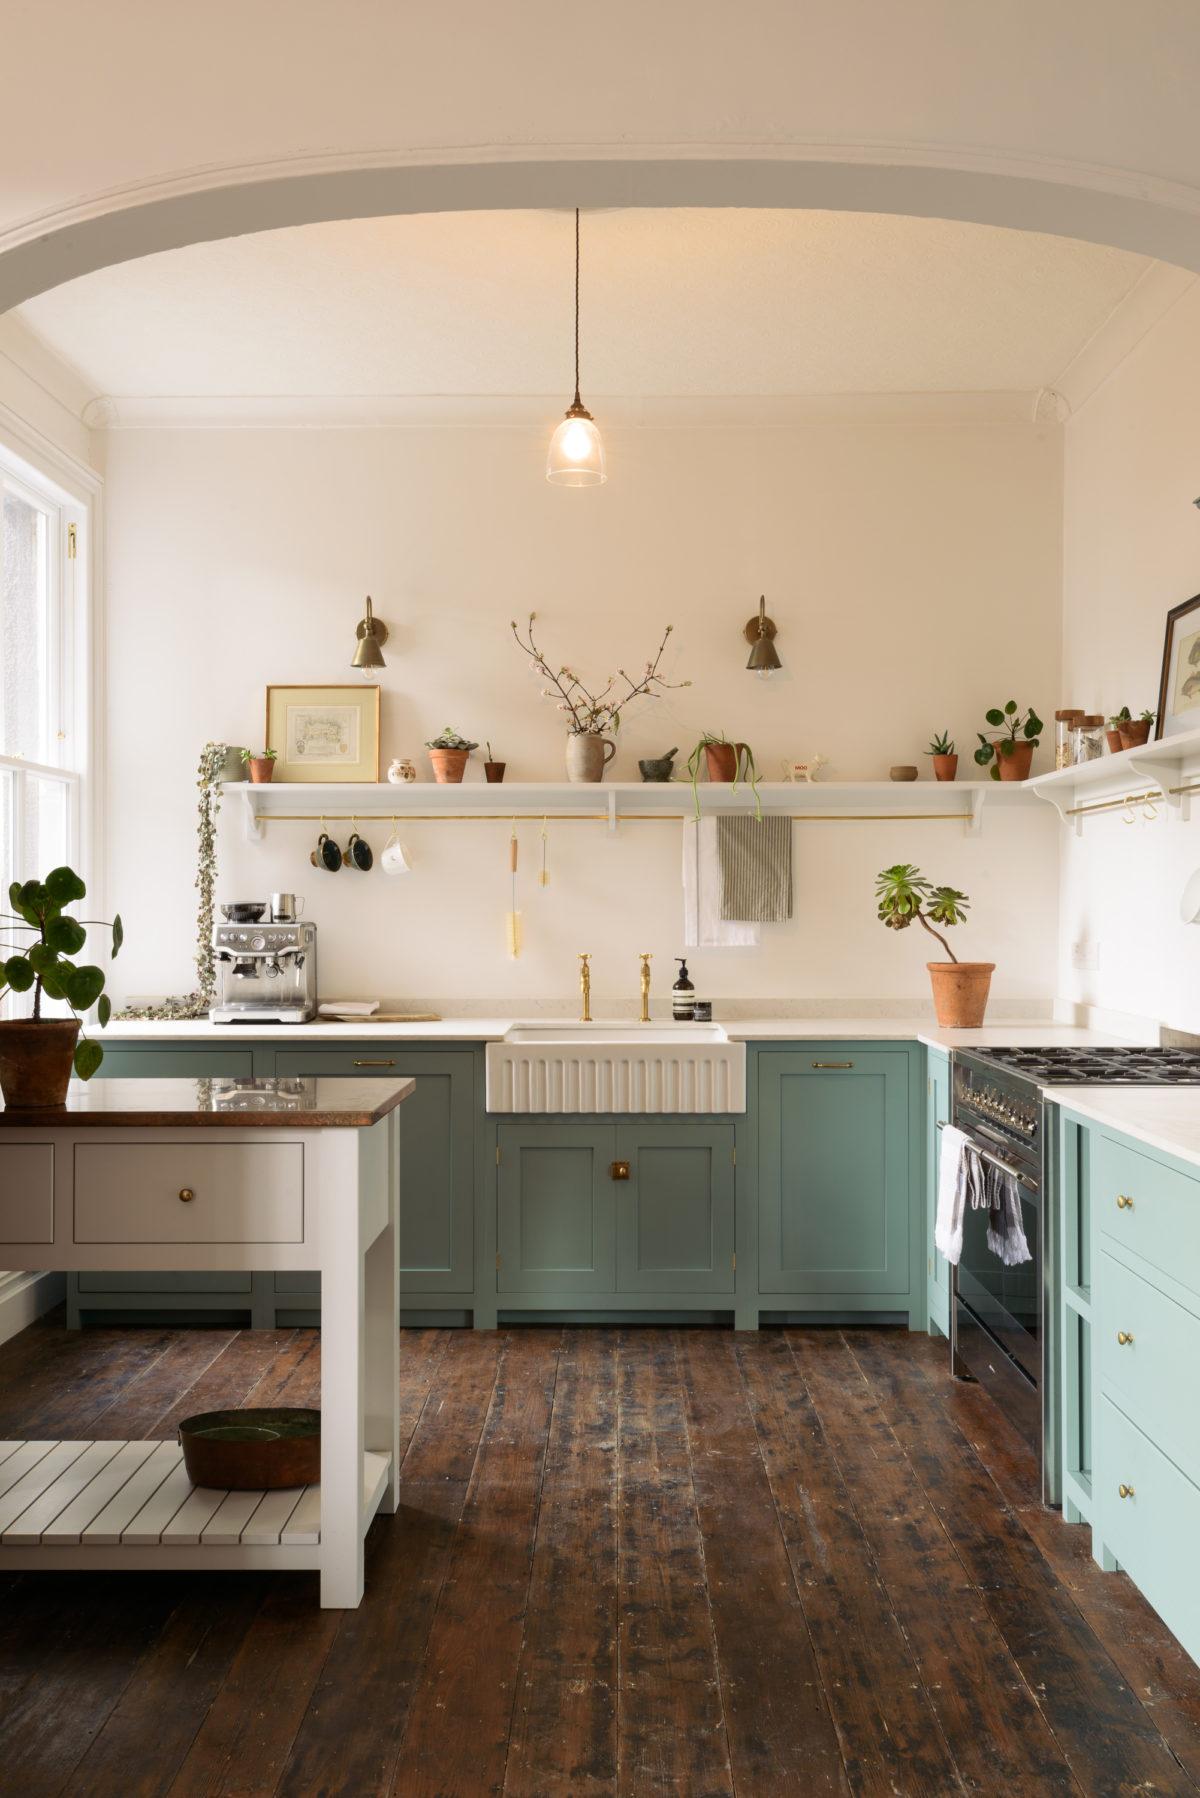 What Kind Of Flooring Should I Go For In My Kitchen The Devol Journal Devol Kitchens